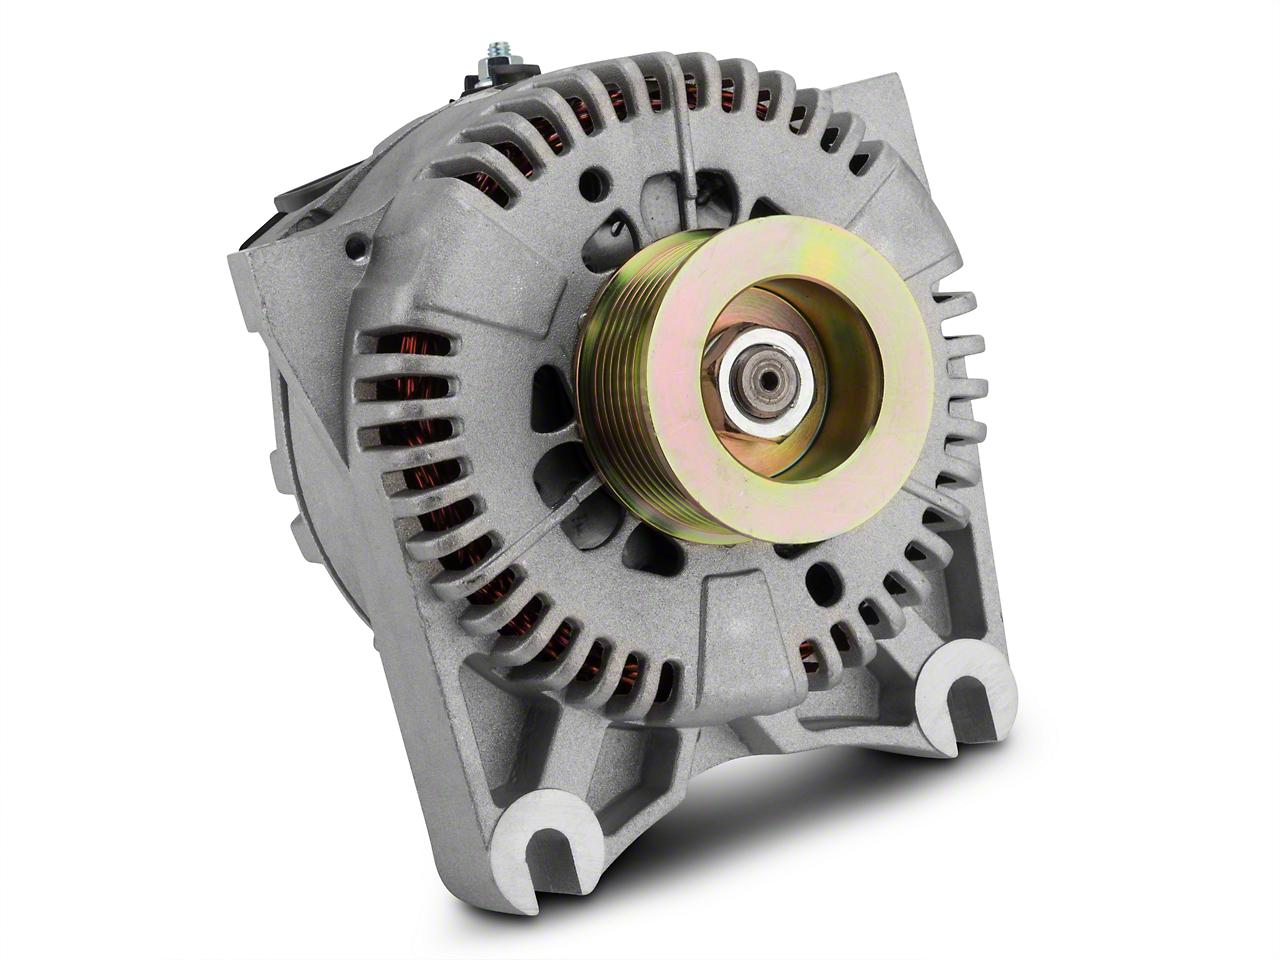 PA Performance High Output Alternator - 200 Amp (99-03 F-150 Lightning)